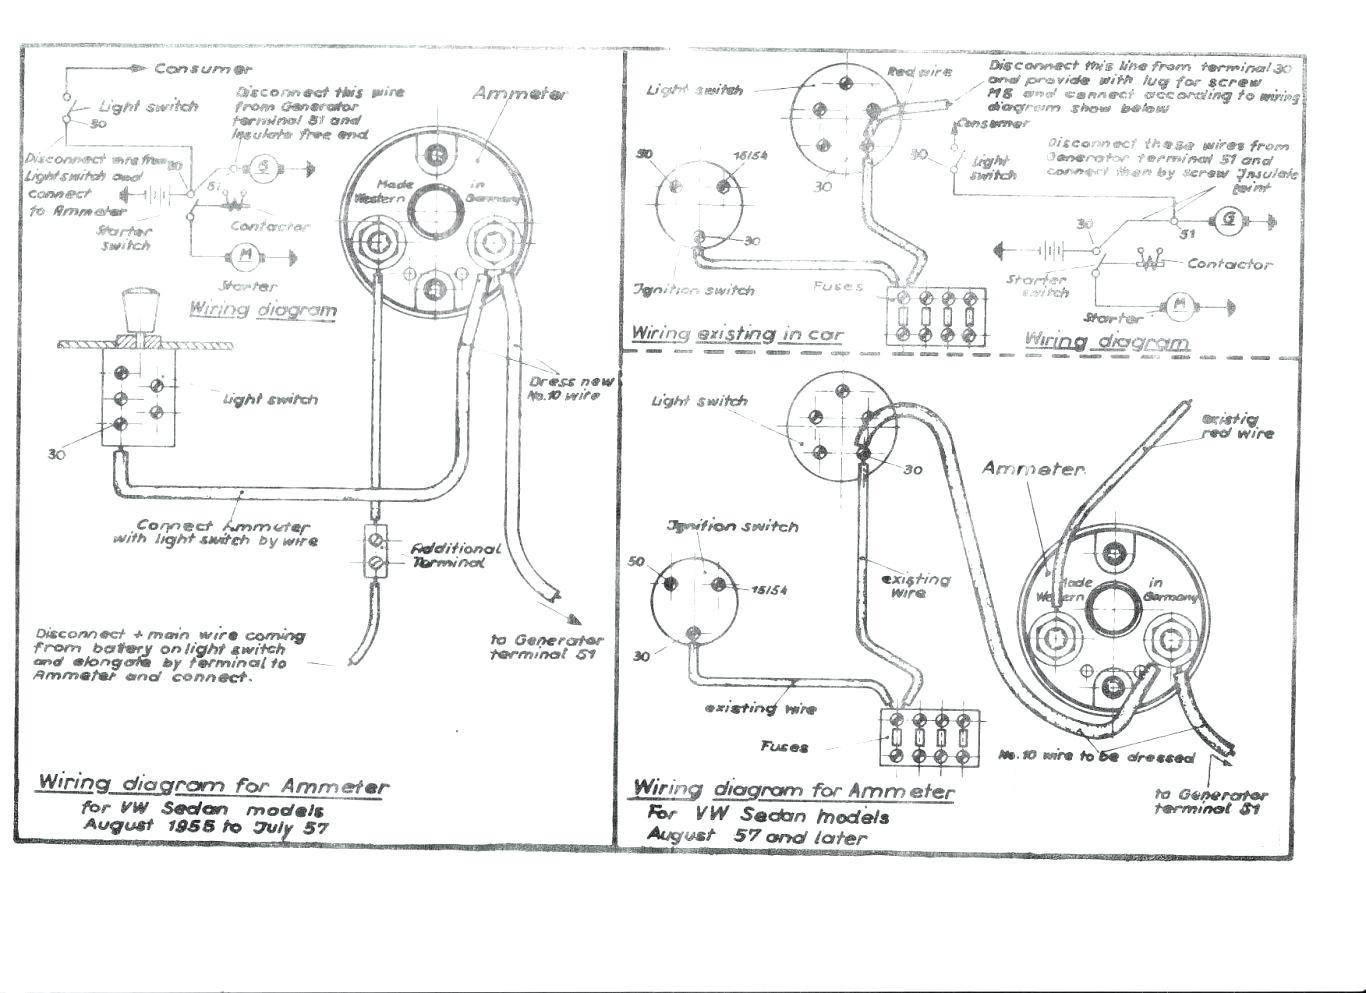 Terrific Autometer Tach Wiring Diagram Wirings Diagram Wiring Cloud Hisonepsysticxongrecoveryedborg